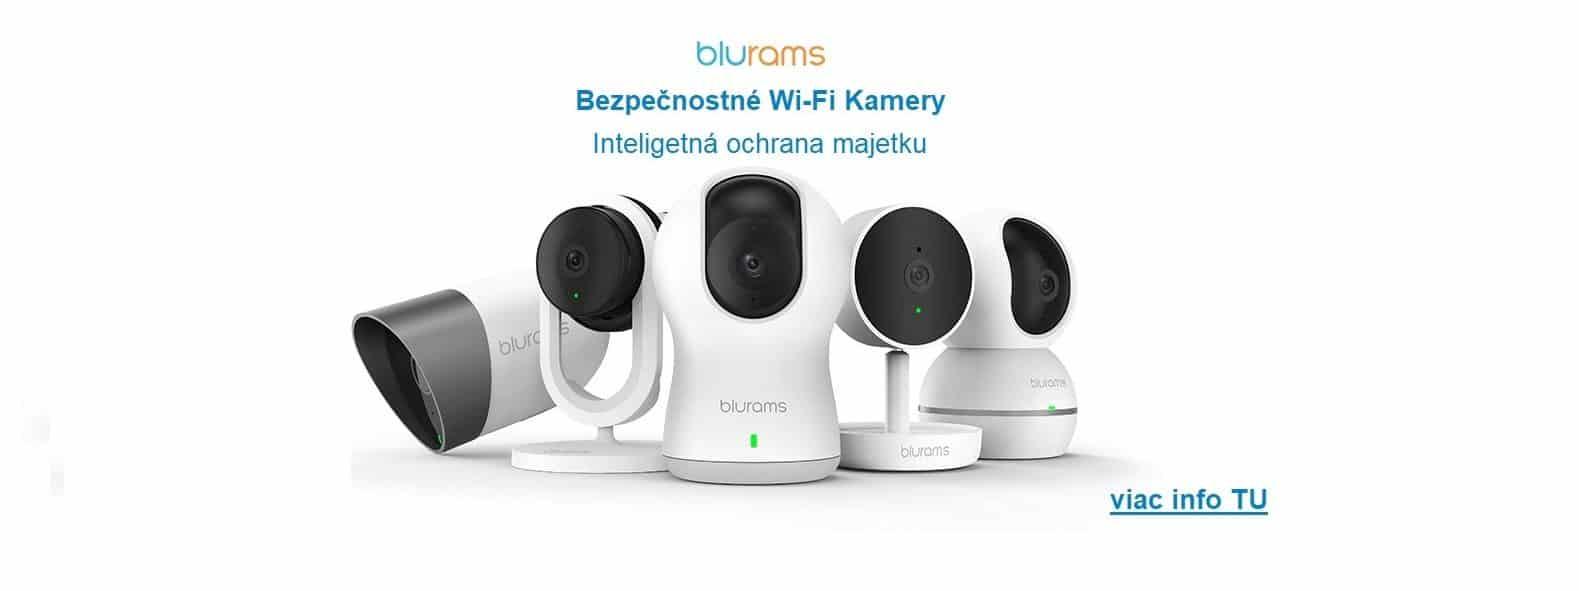 WiFi kamery Blurams